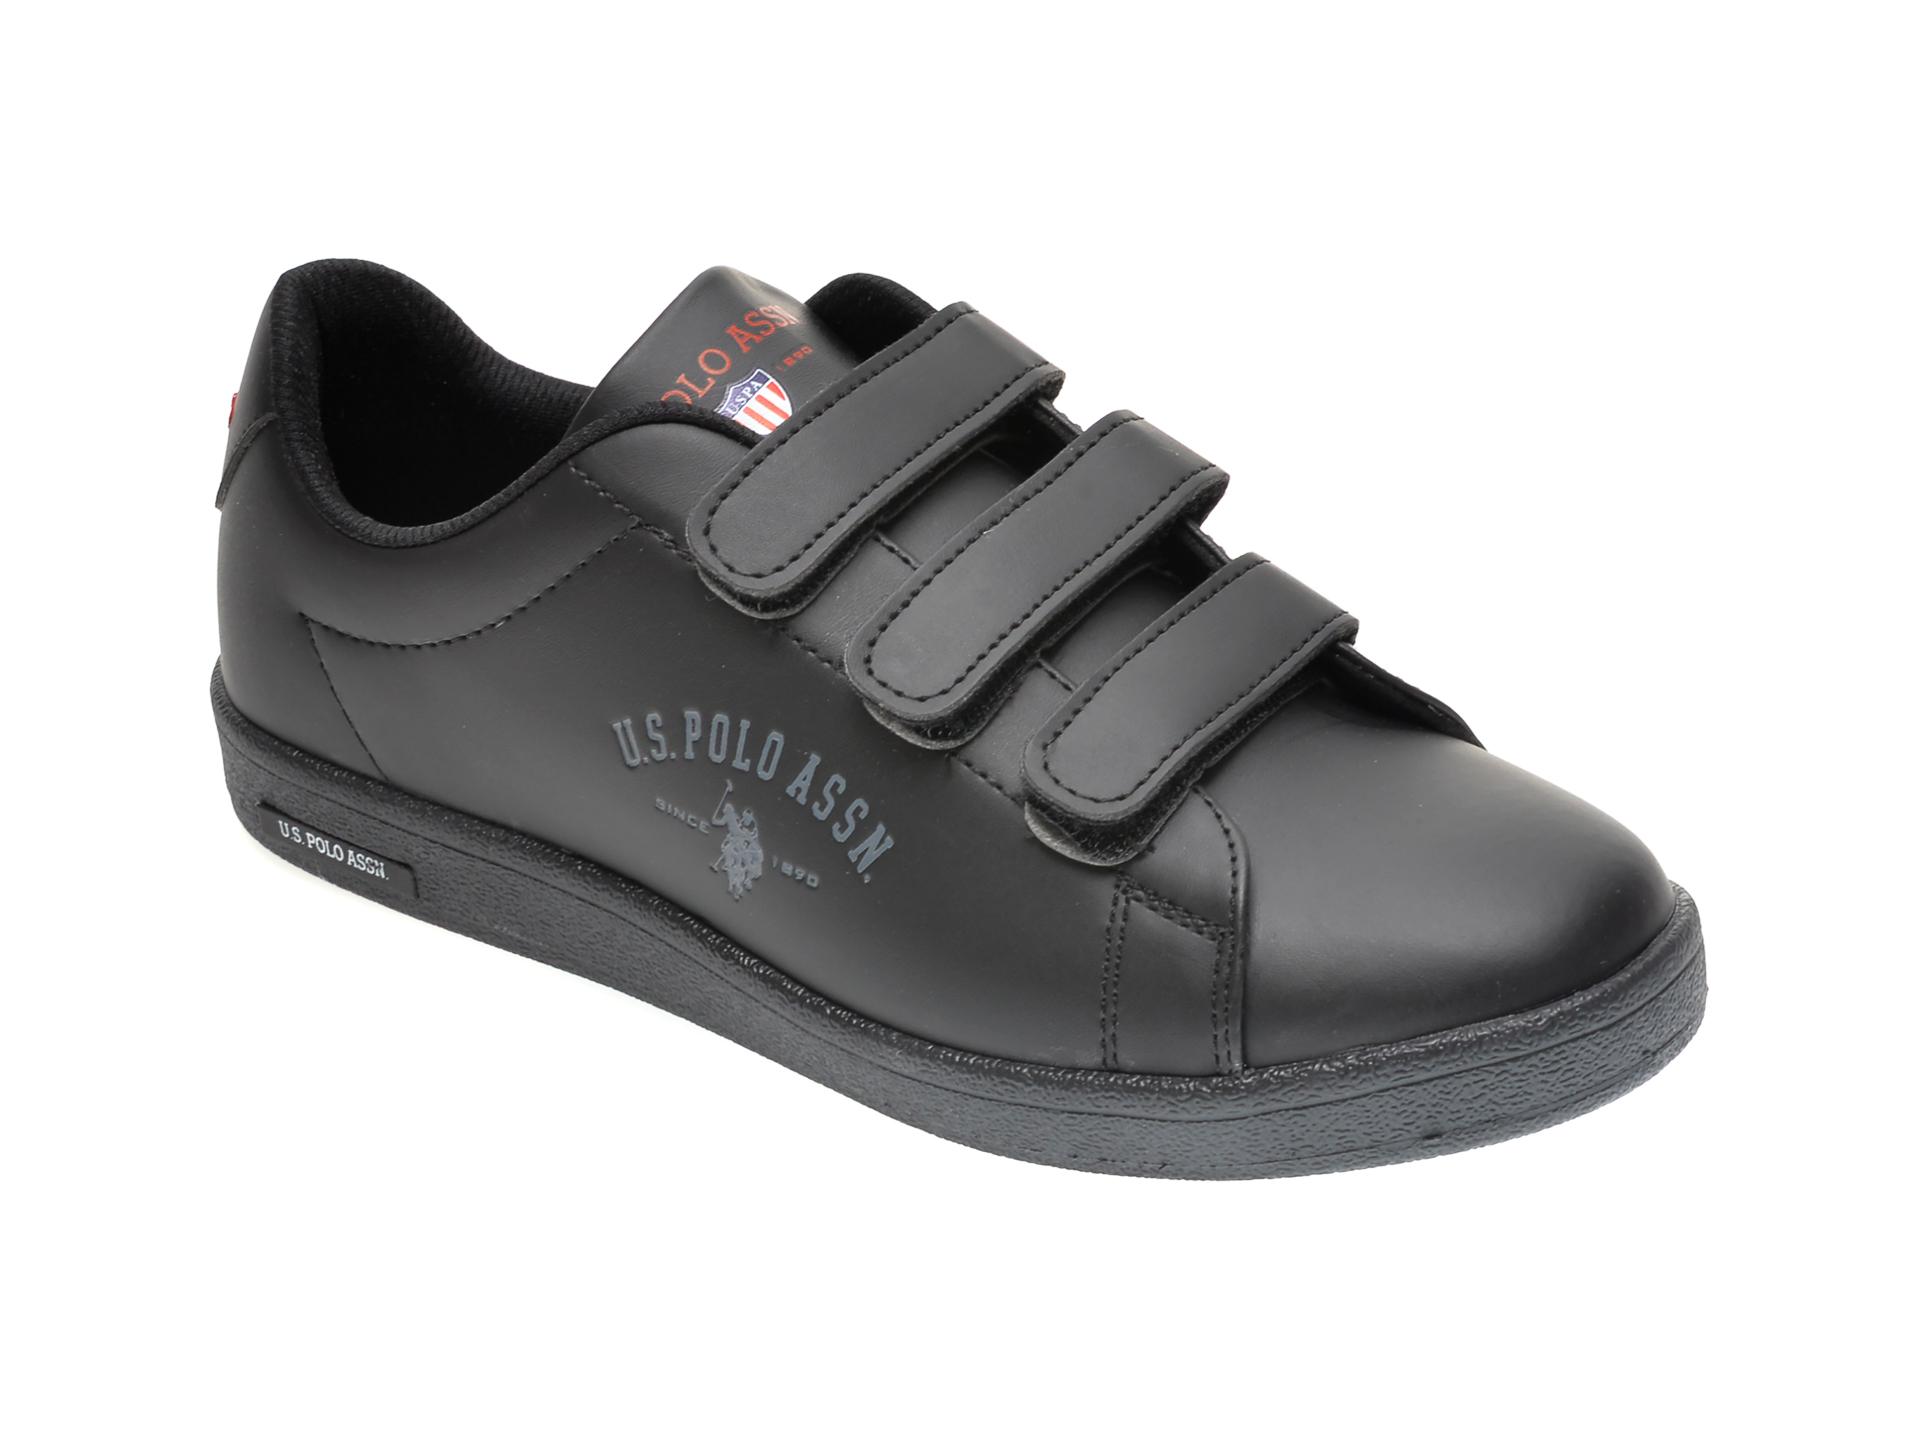 Pantofi sport US POLO ASSN negri, 486446, din piele ecologica imagine otter.ro